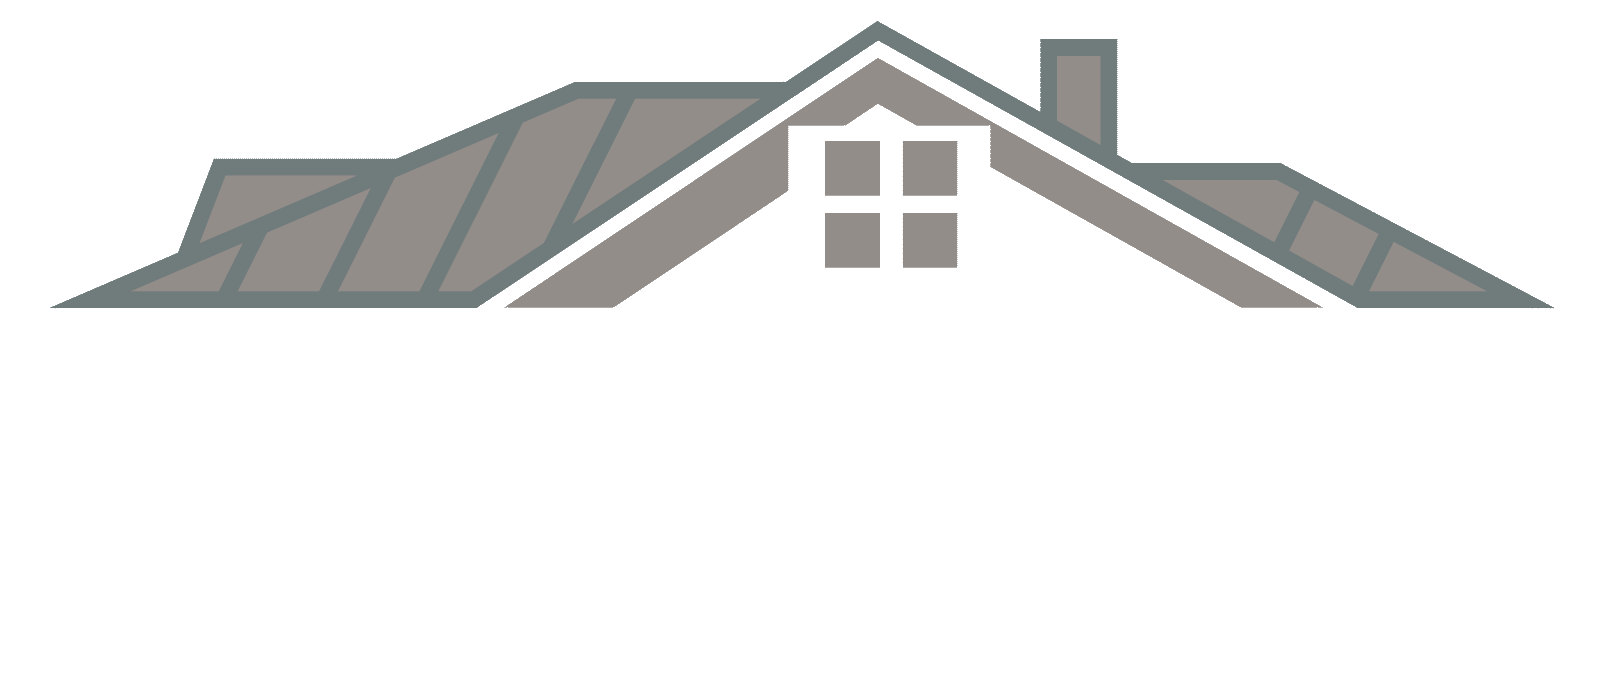 Naples Custom Home Building Contractors | Nourse Building Company Inc